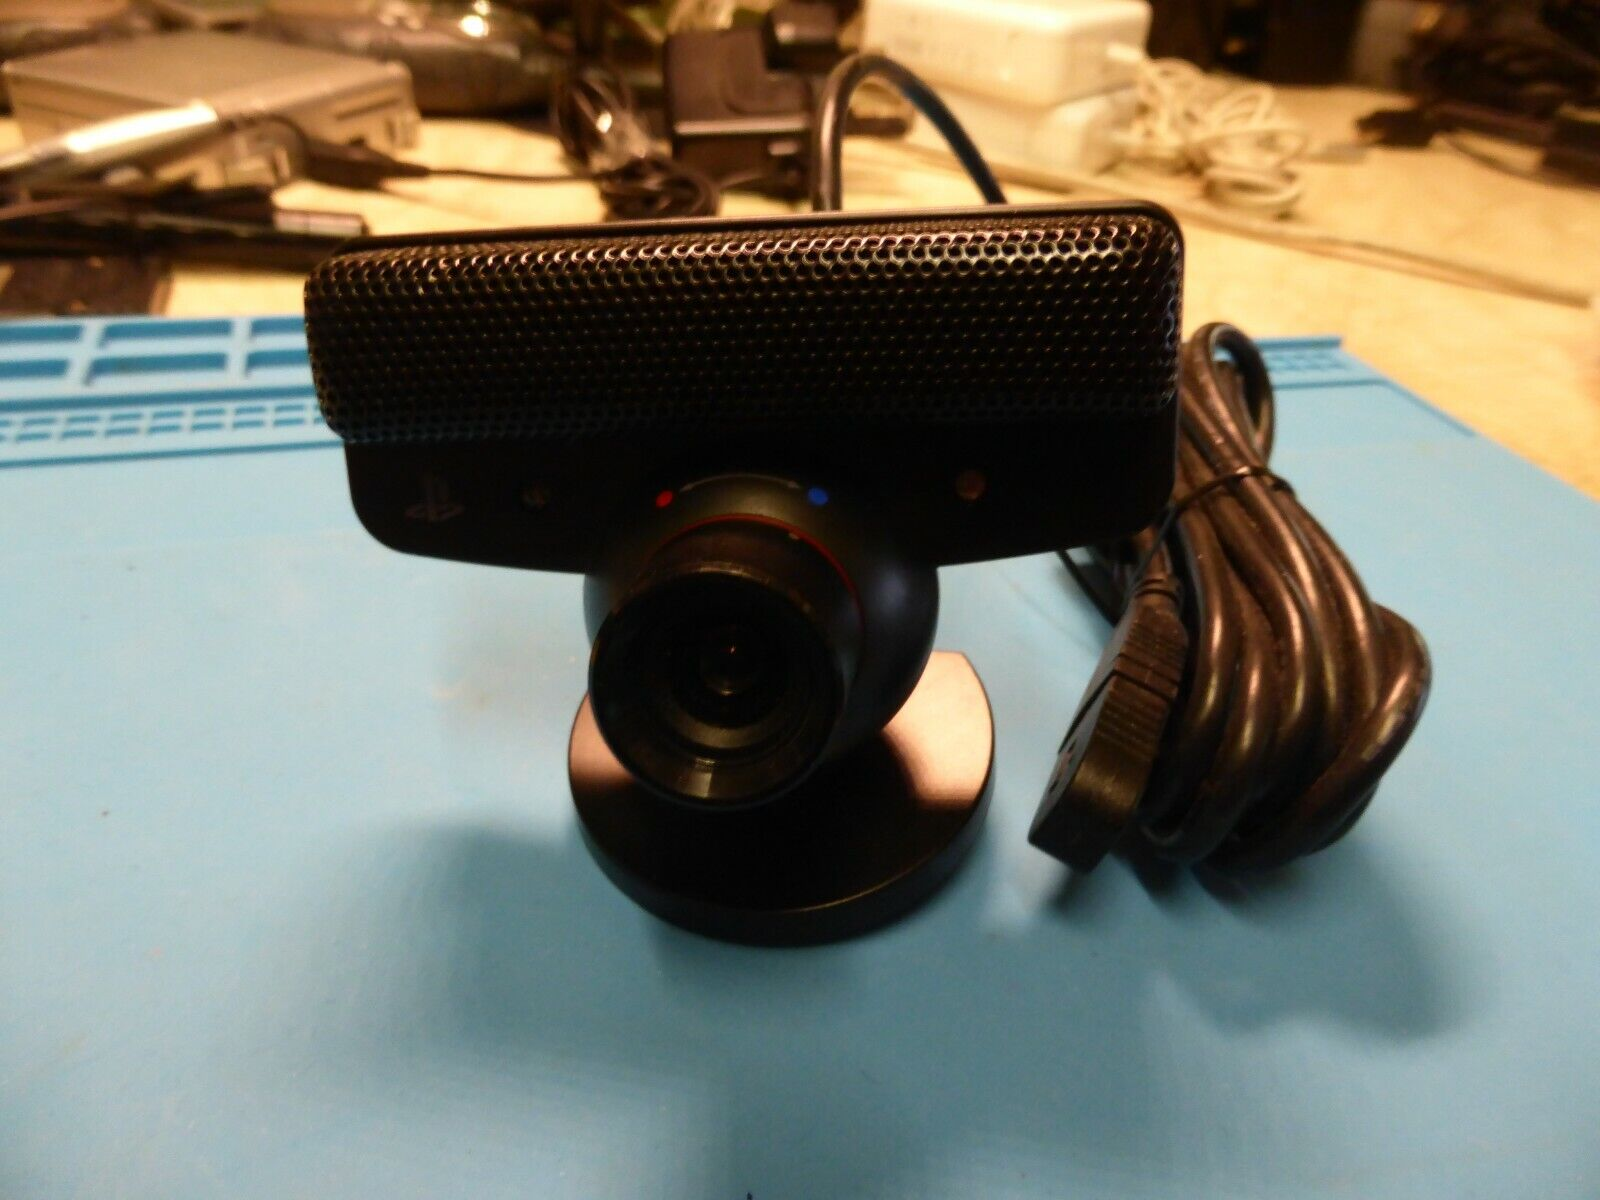 Genuine Sony Playstation 3 eyetoy camera black PS3 official - Unused